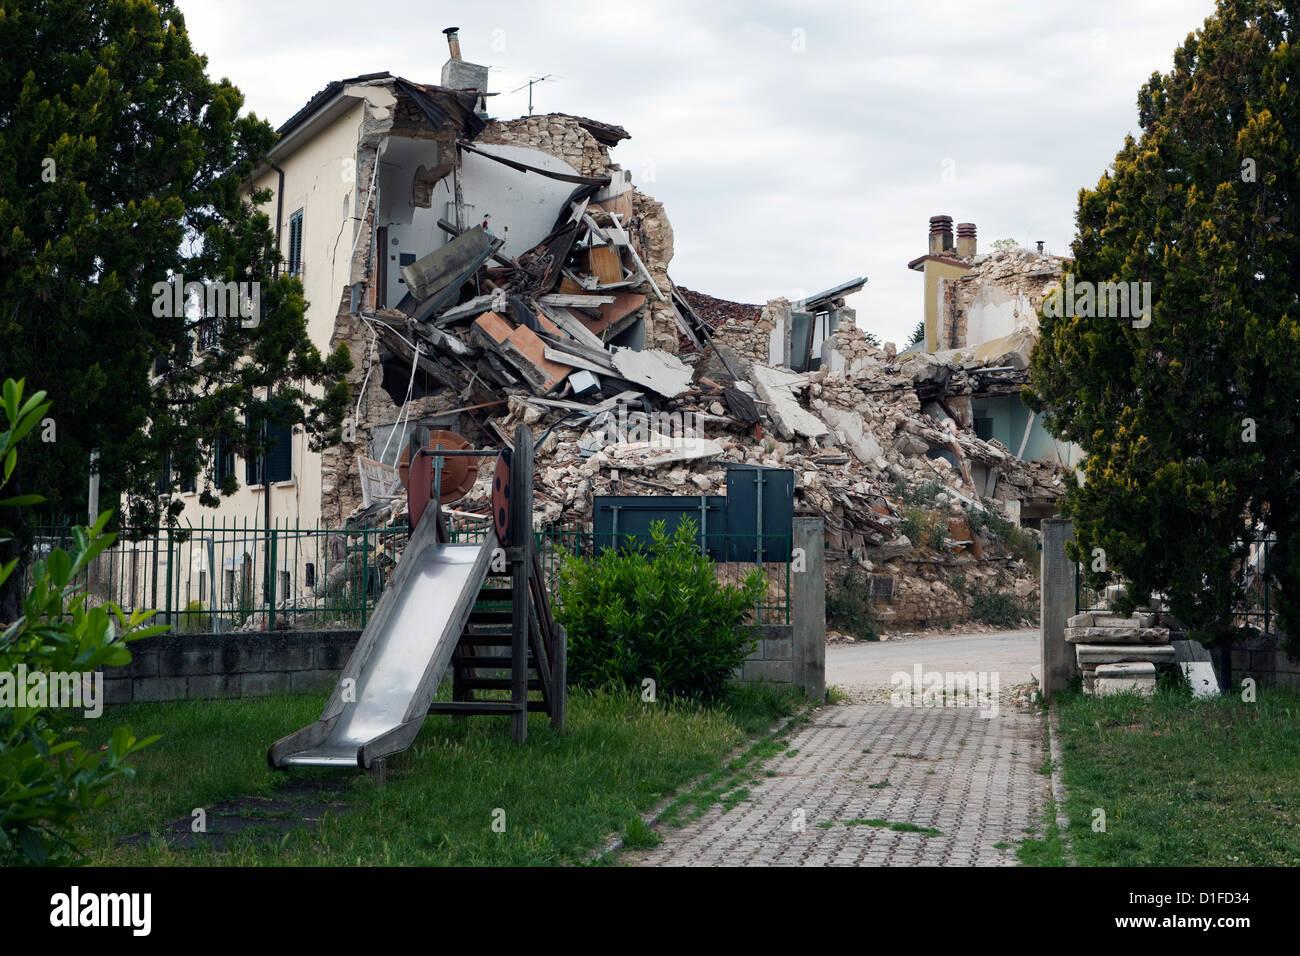 Onna zeigt Erdbeben Schäden, Aquila, Abruzzen, Italien, Europa Stockbild